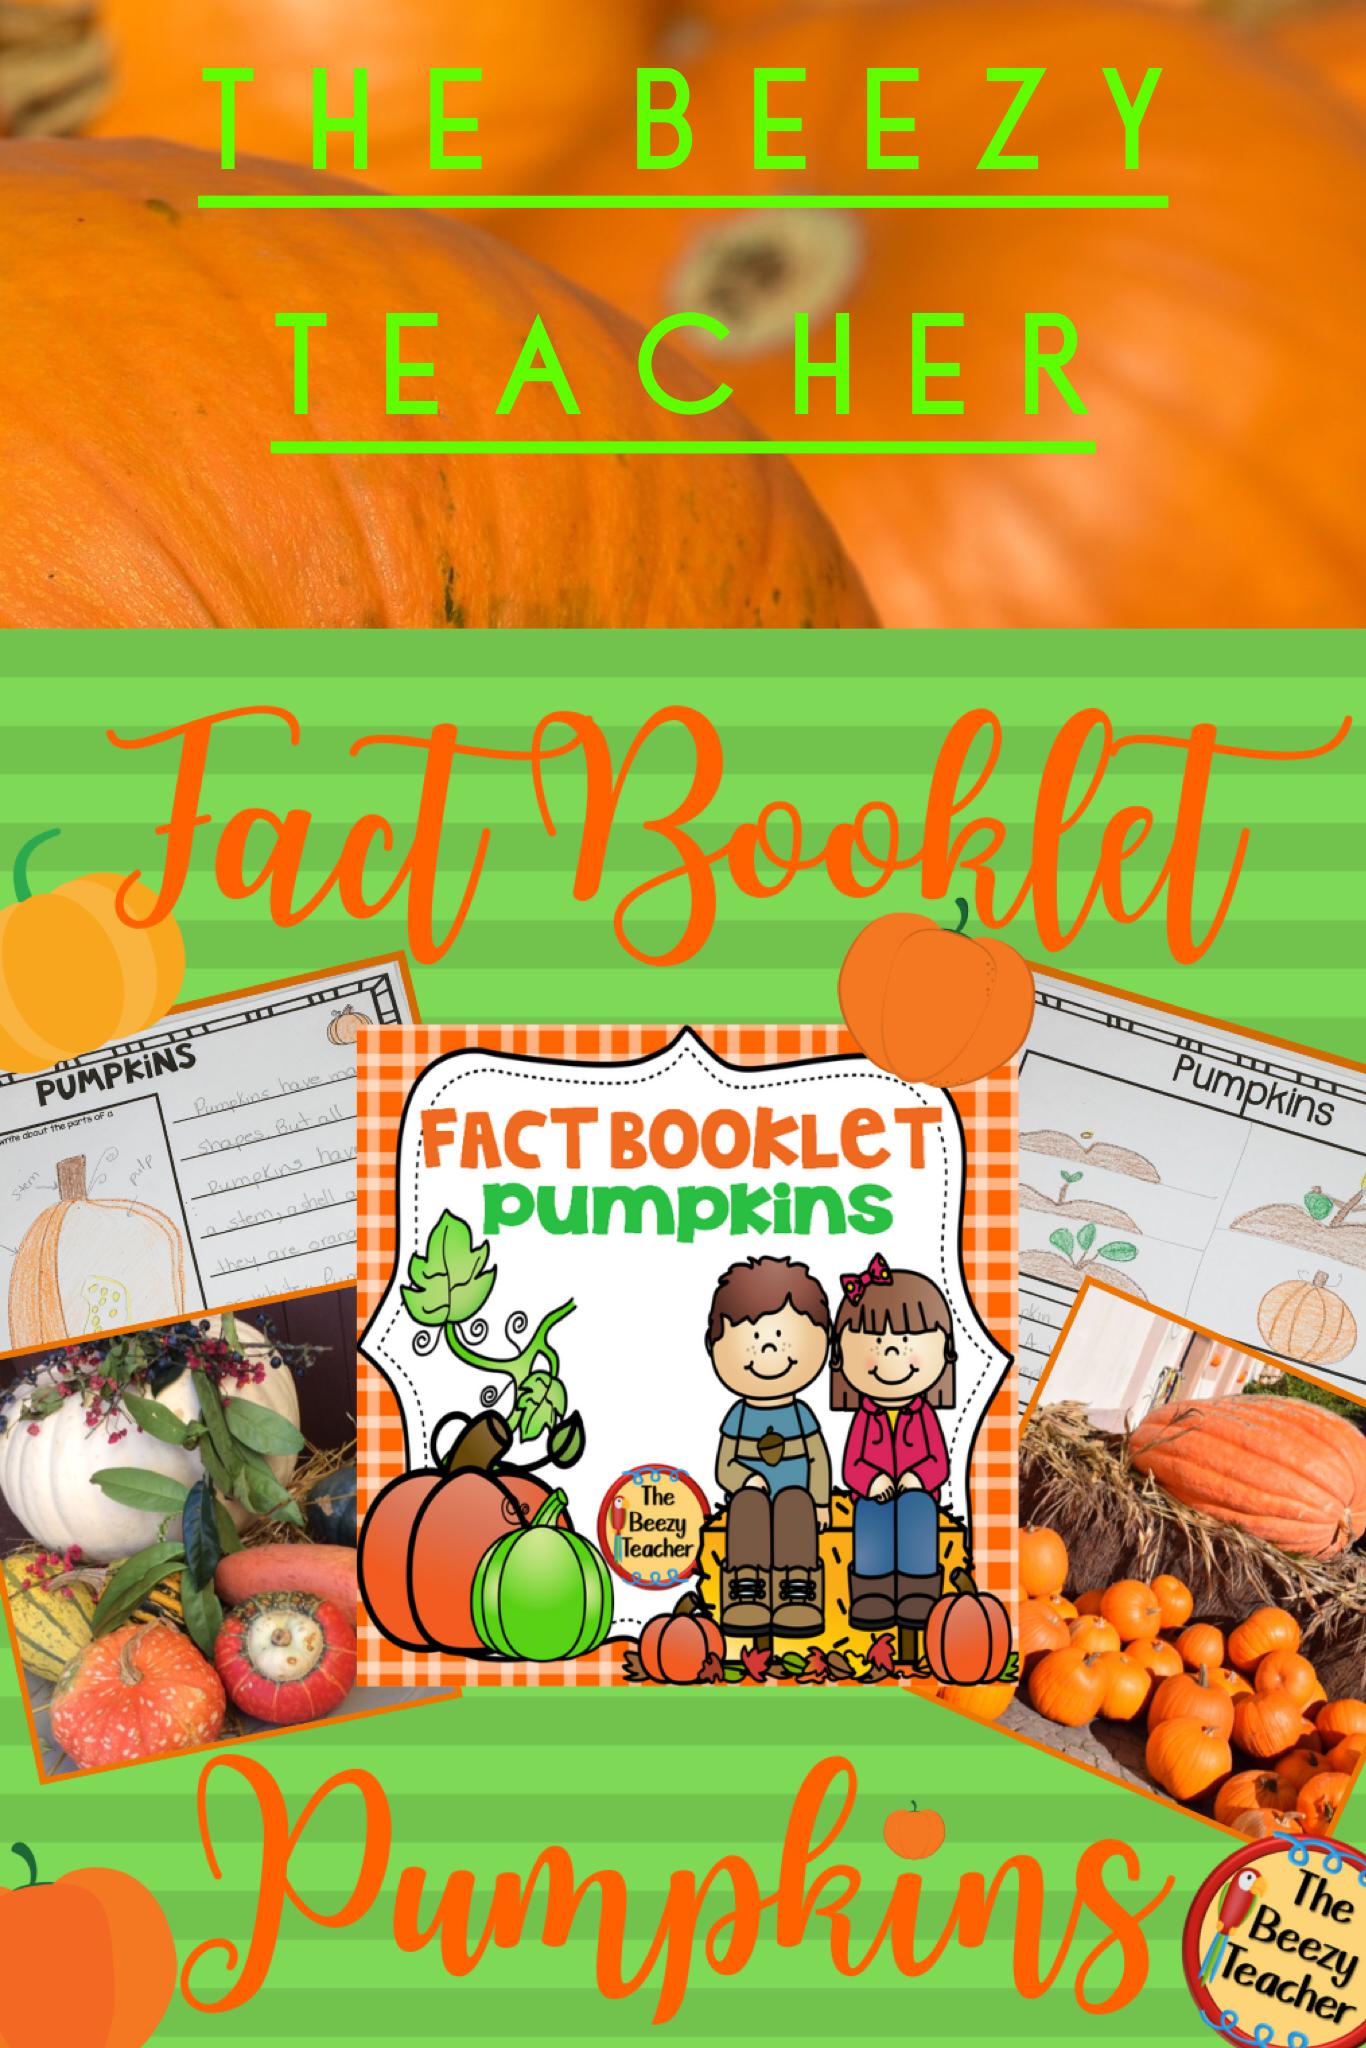 Pumpkins Fact Booklet